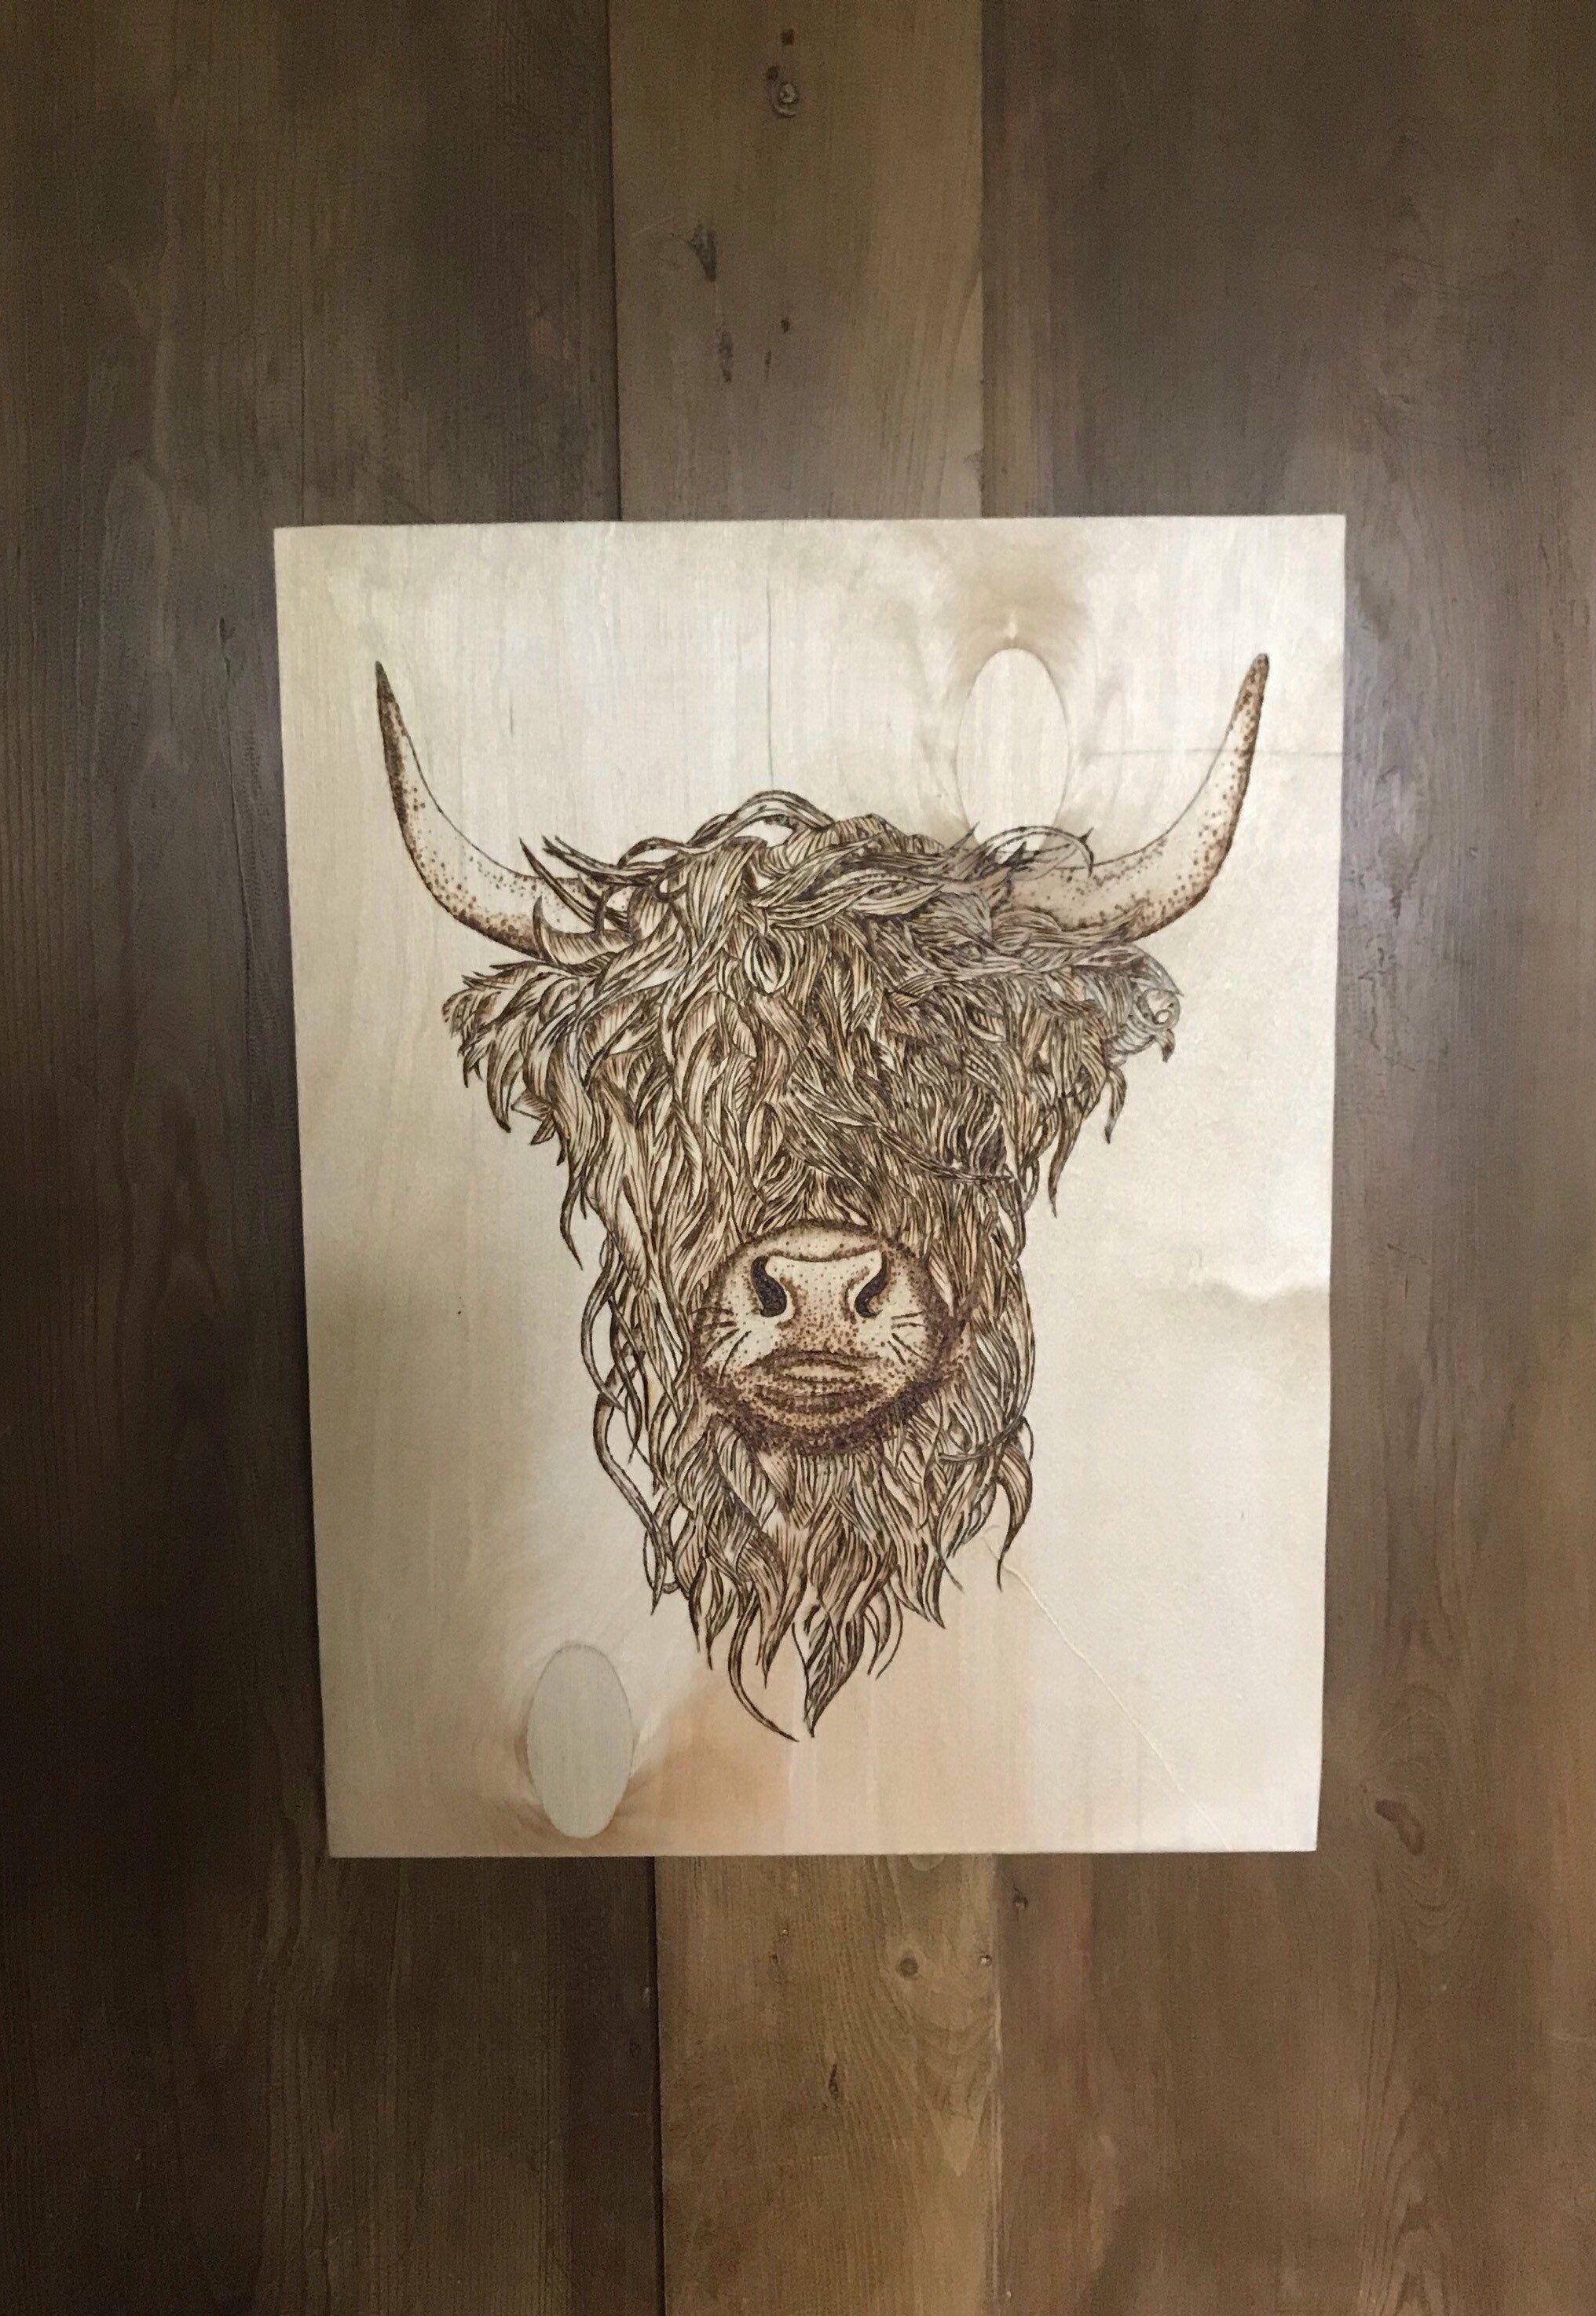 Highland Cow Wall Hanging Hand Pyrography Wood Burning Etsy Highland Cow Tattoo Highland Cow Handmade Wall Art